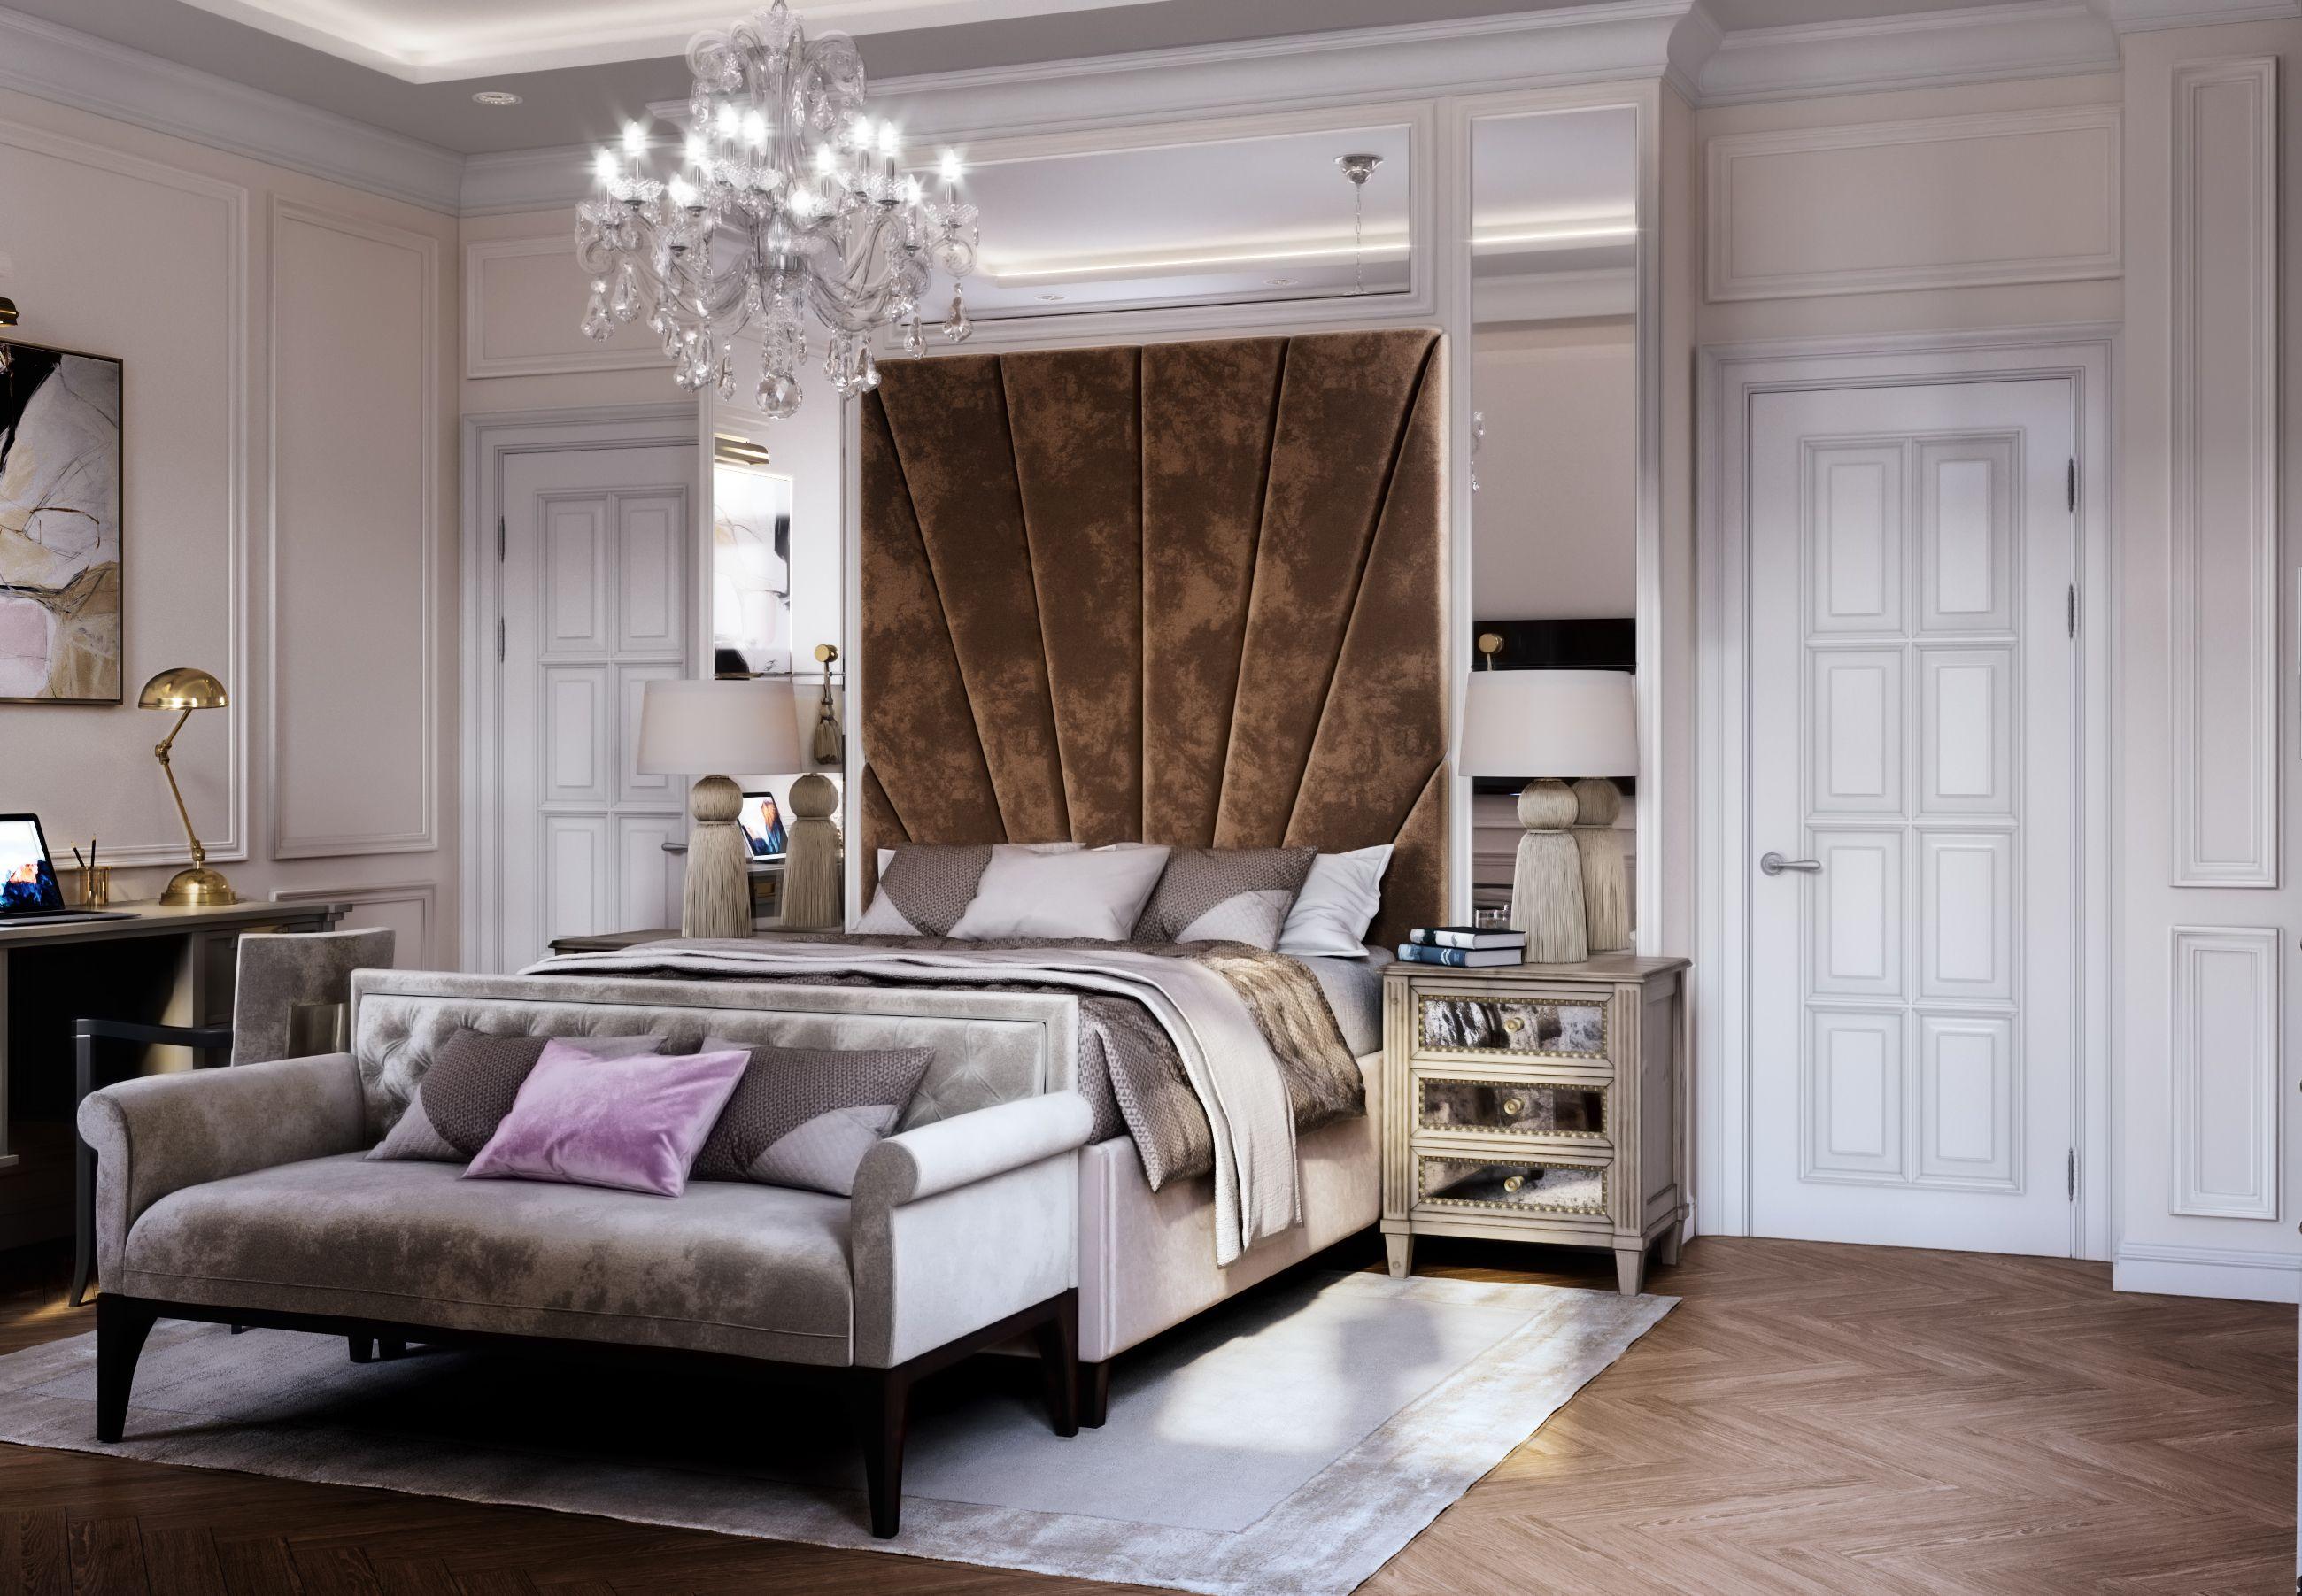 Bedroom Bedroom, Interior, Home decor